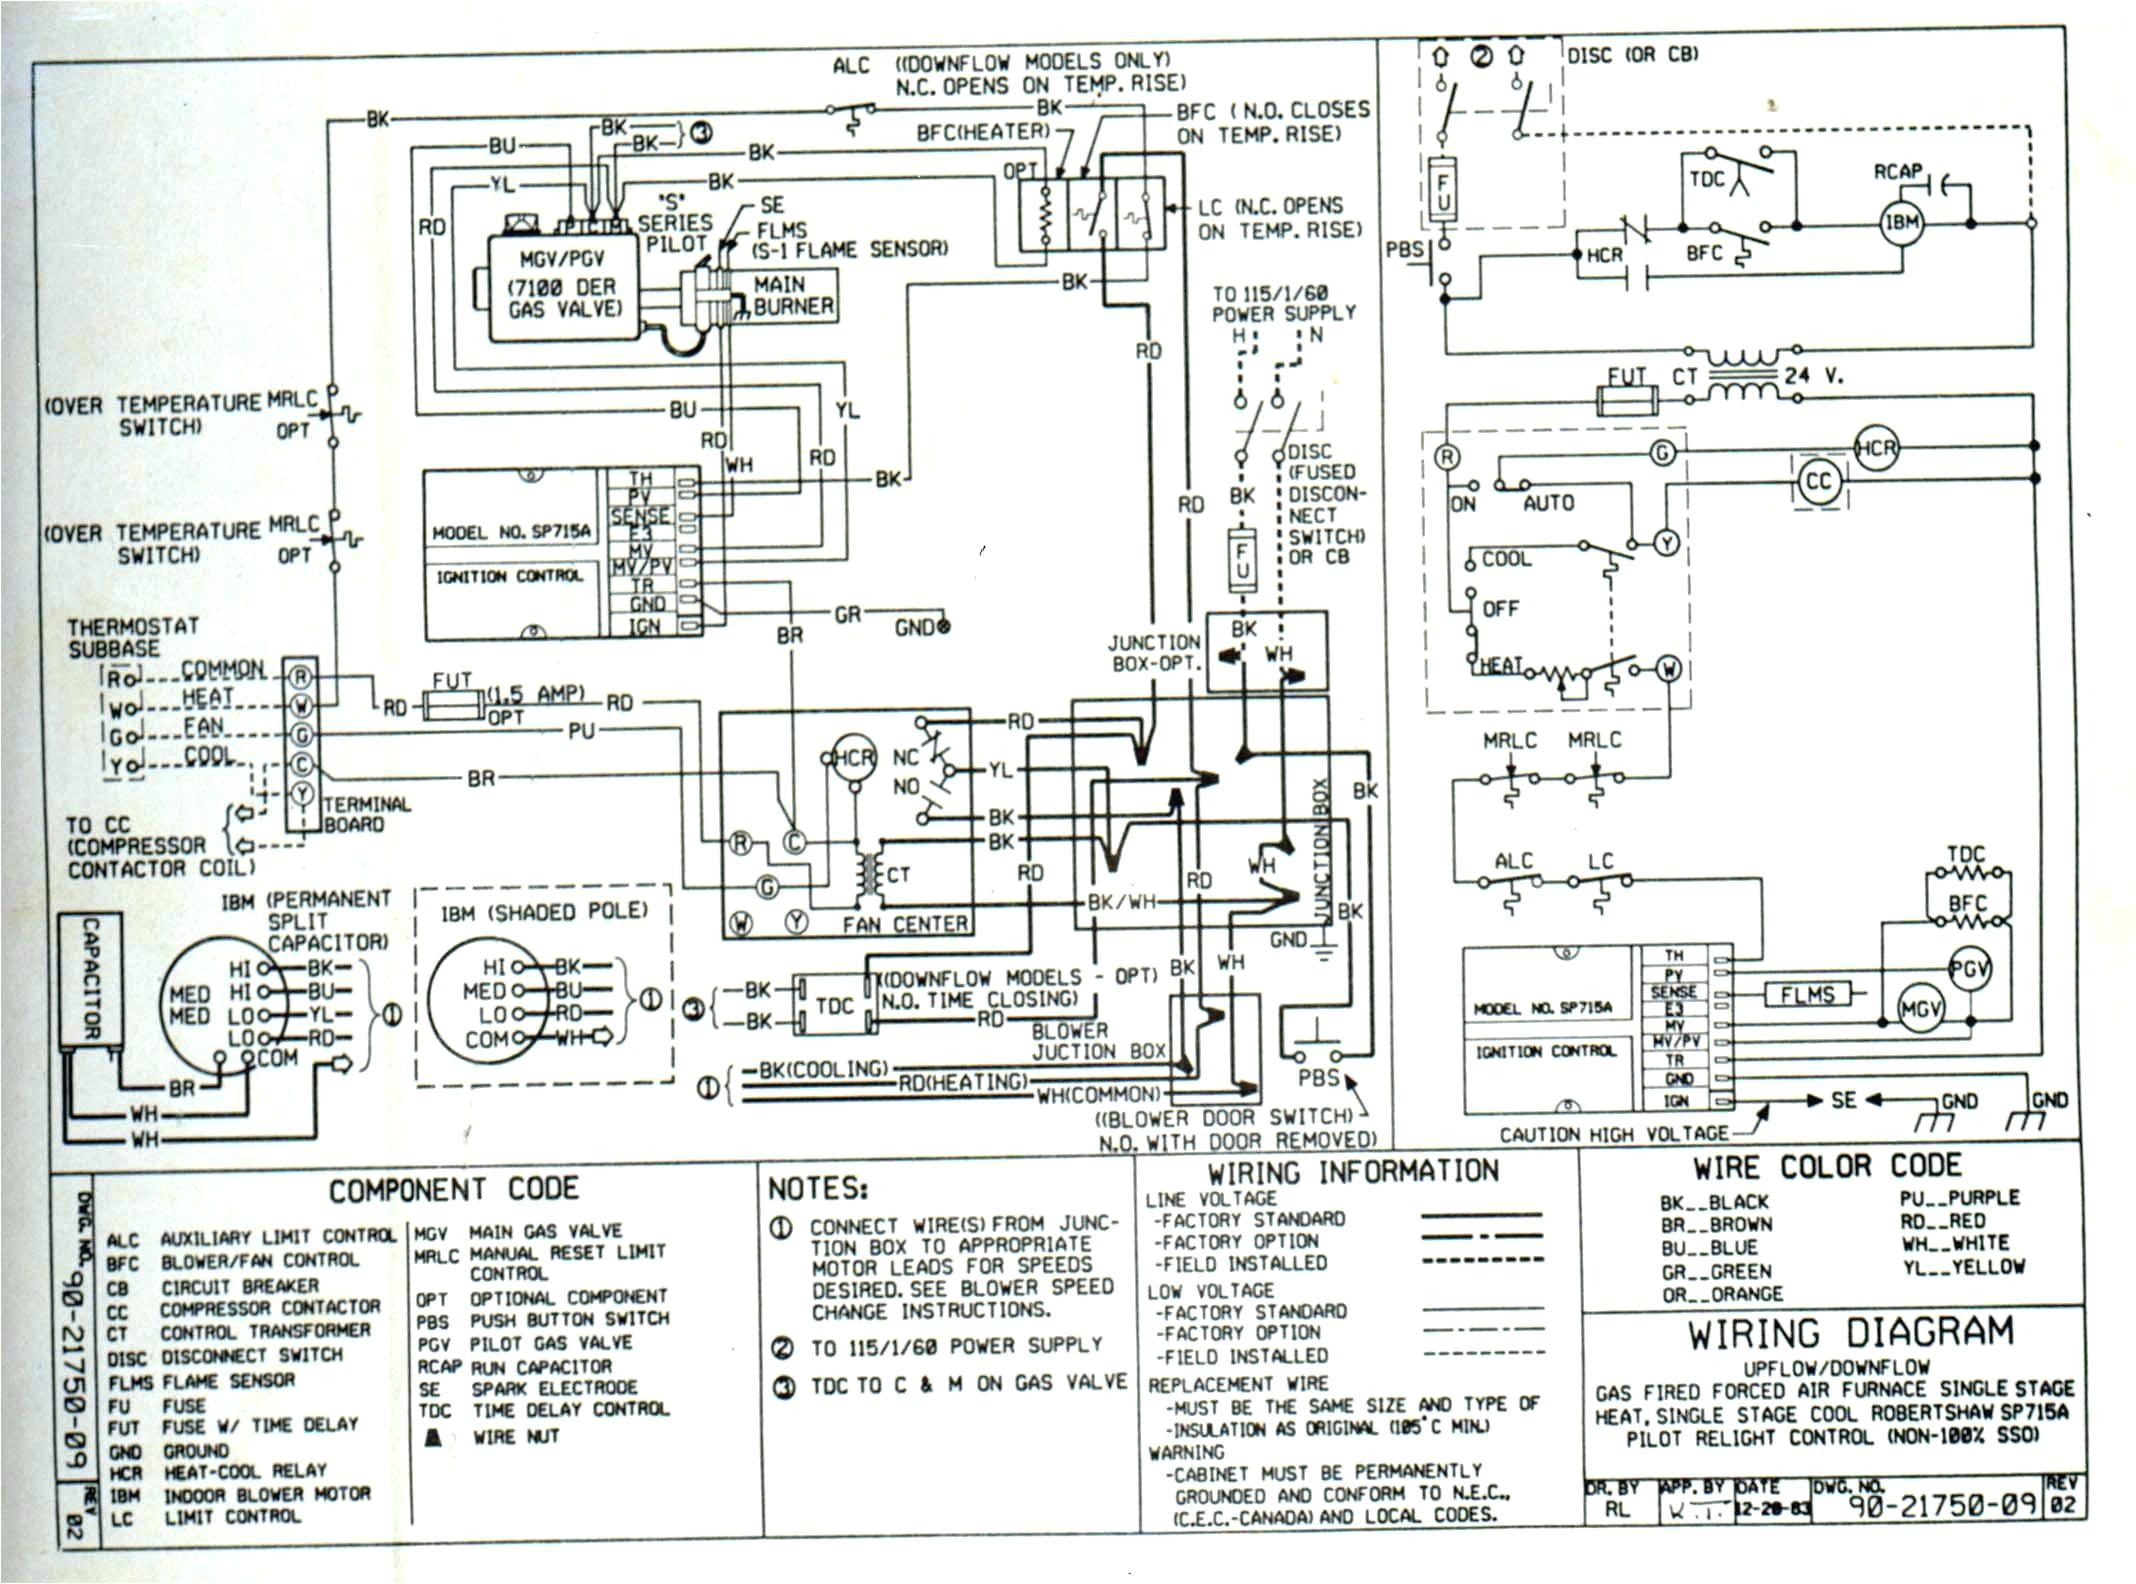 trane wiring schematics wiring diagram mega trane wiring diagrams 2307 5588